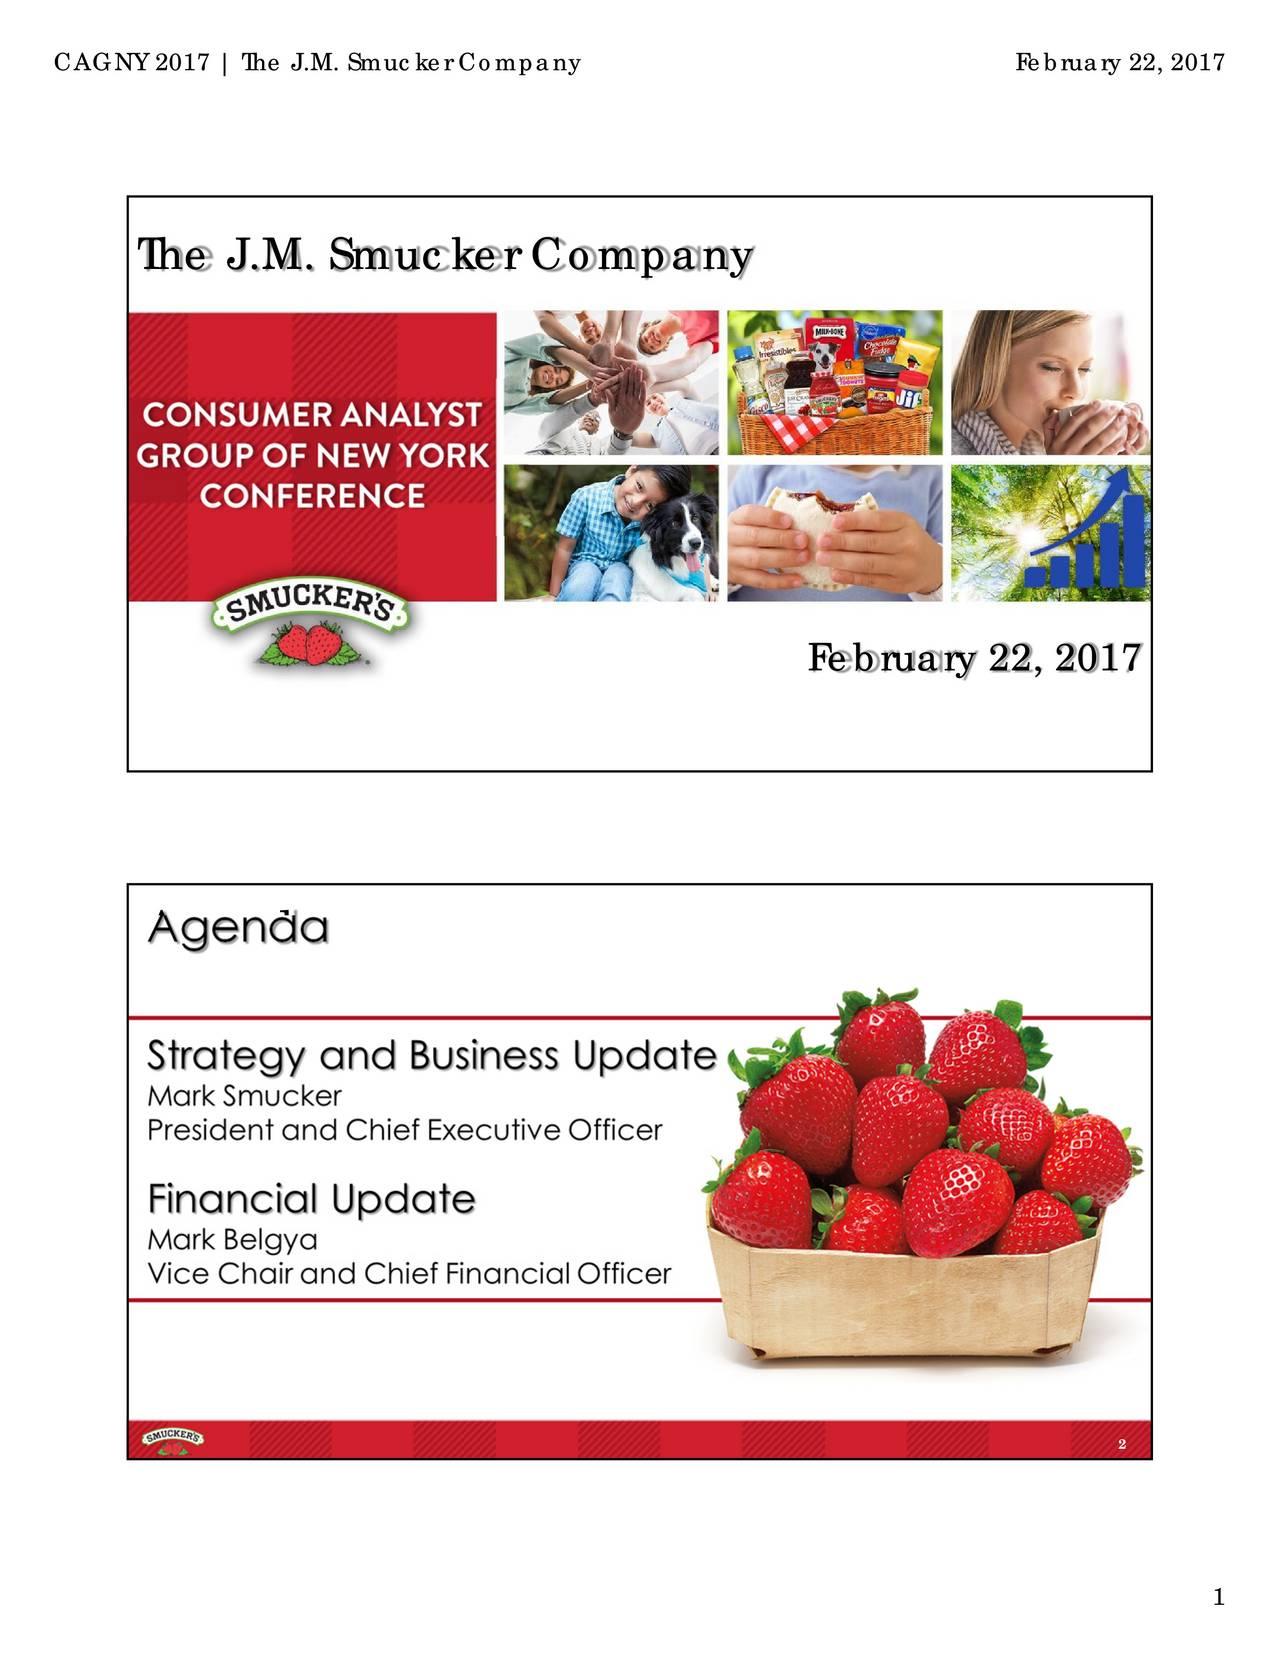 The J.M. Smucker Company February 22, 2017 Agenda 2 1